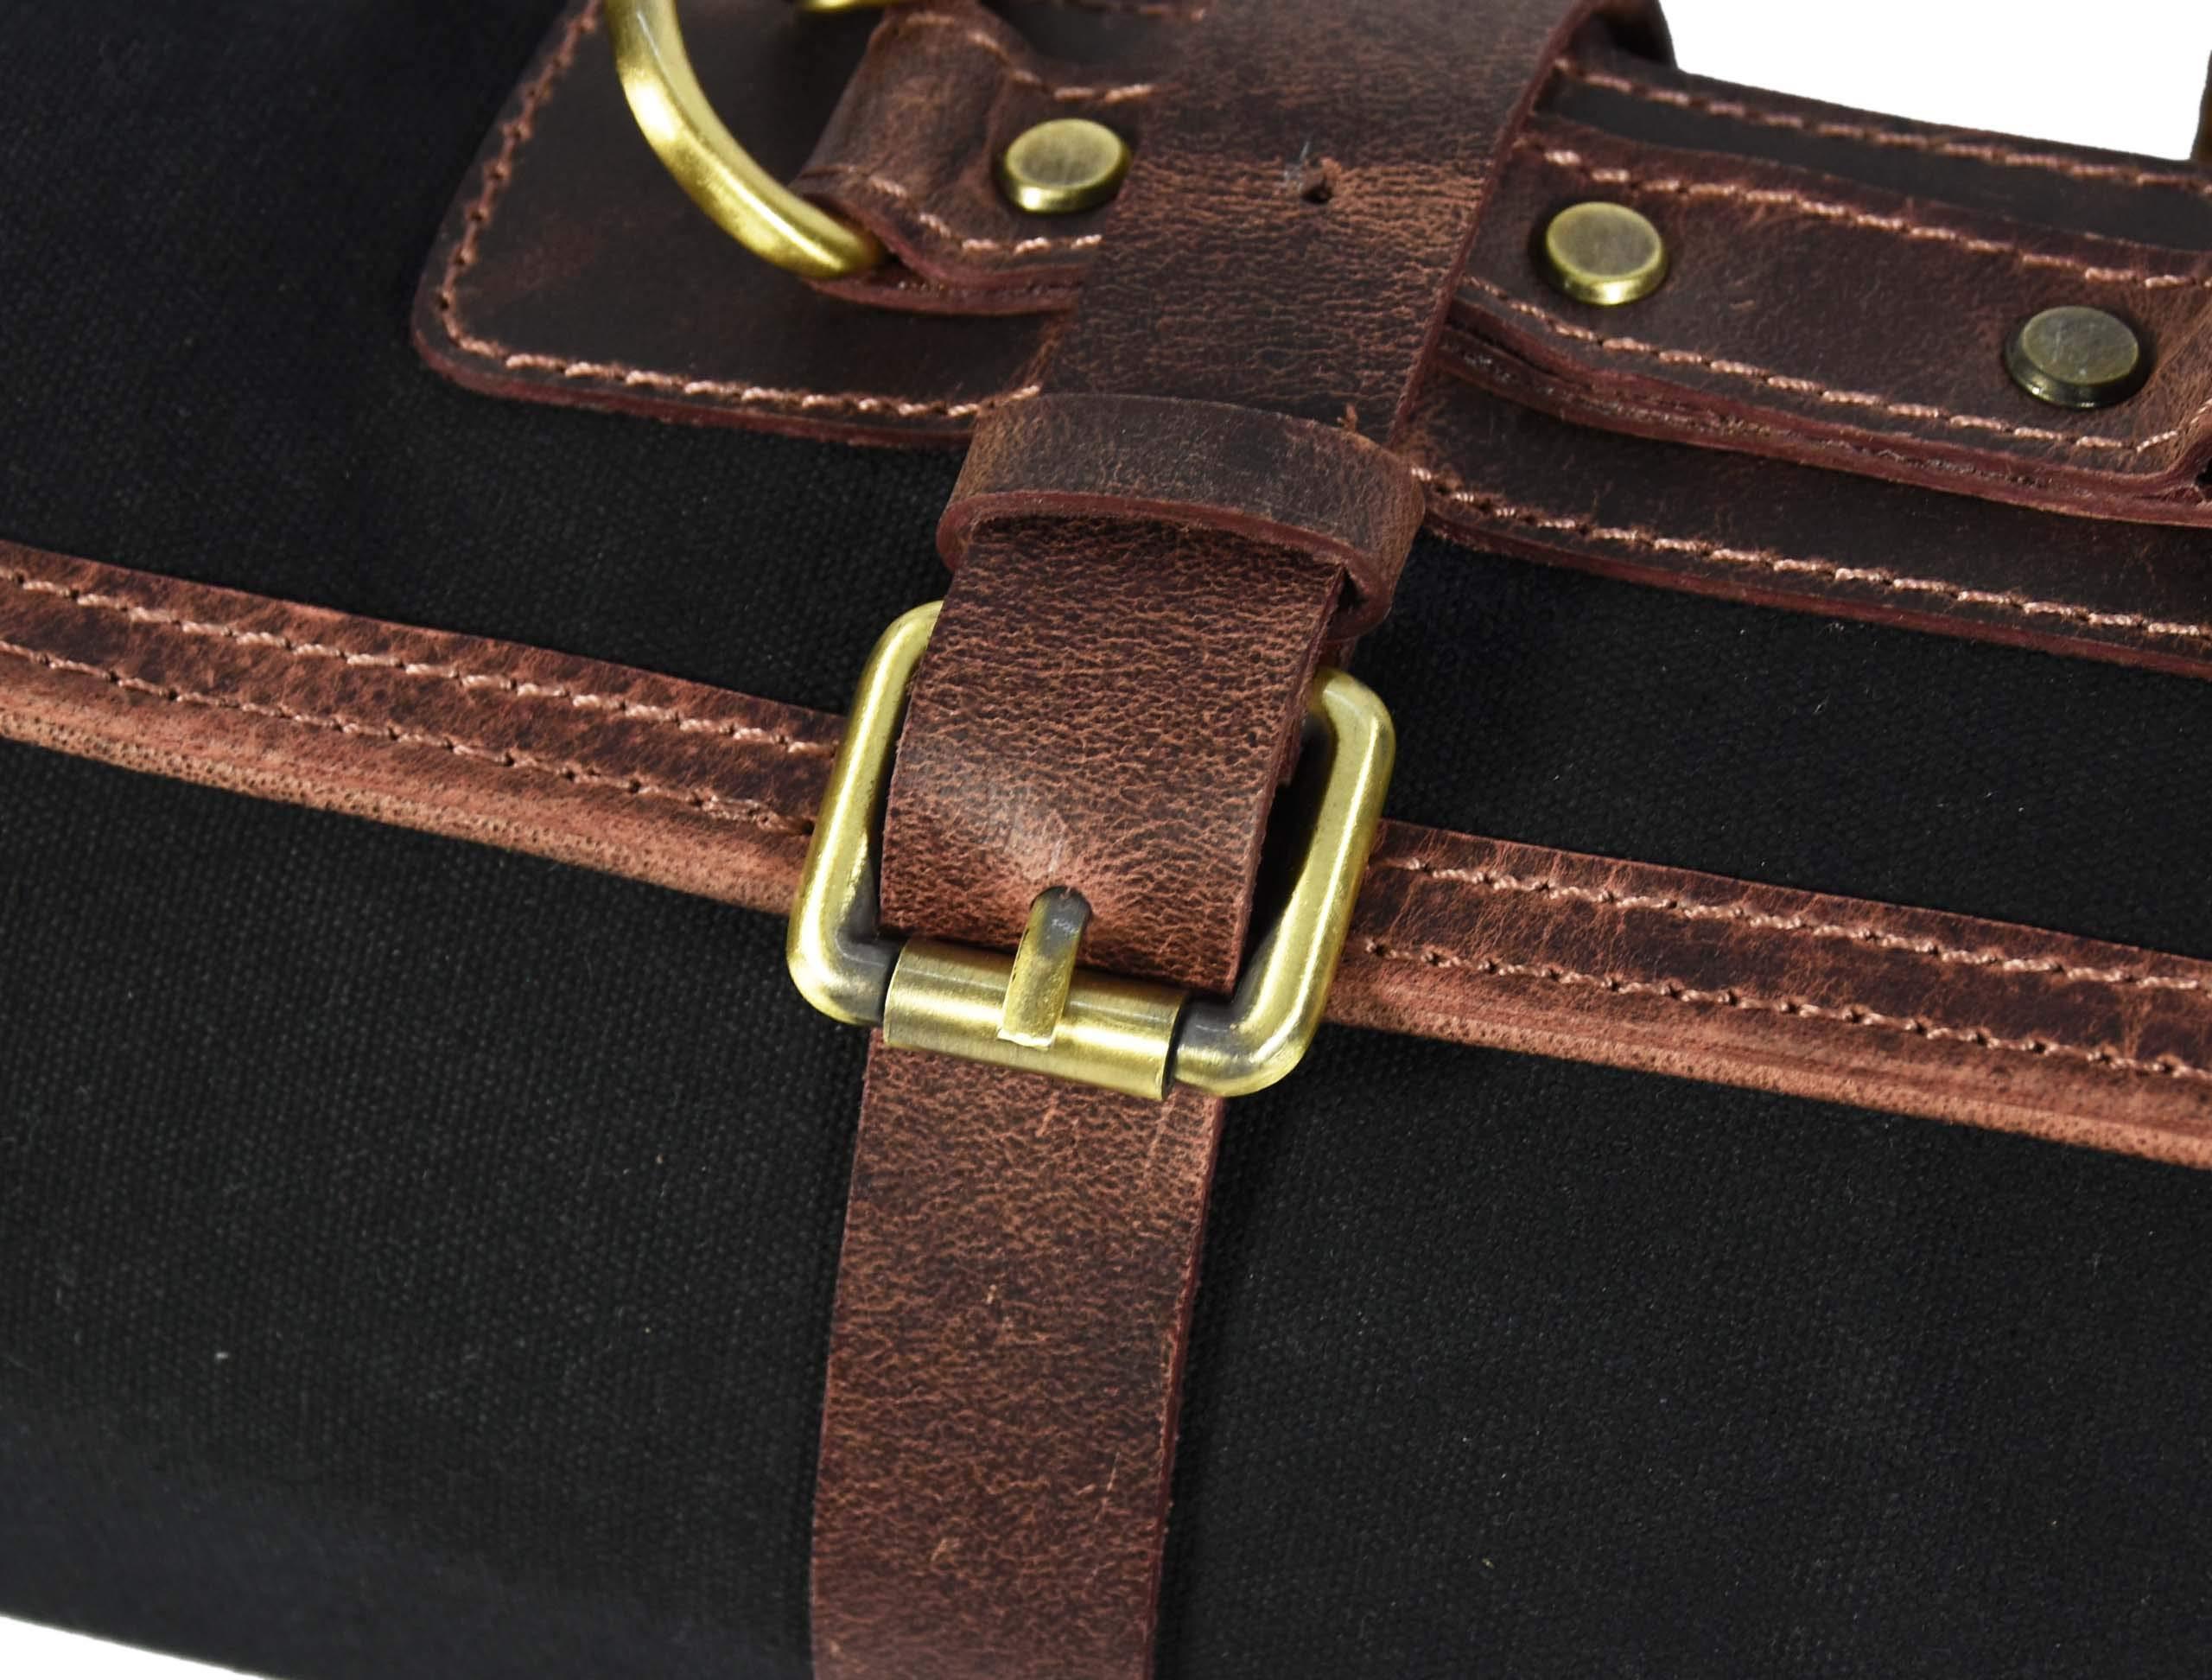 Leather Knife Roll Storage Bag   Elastic and Expandable 10 Pockets   Adjustable/Detachable Shoulder Strap   Travel-Friendly Chef Knife Case Roll By Aaron Leather (Raven, Canvas) by AARON LEATHER GOODS VENDIMIA ESTILO (Image #9)